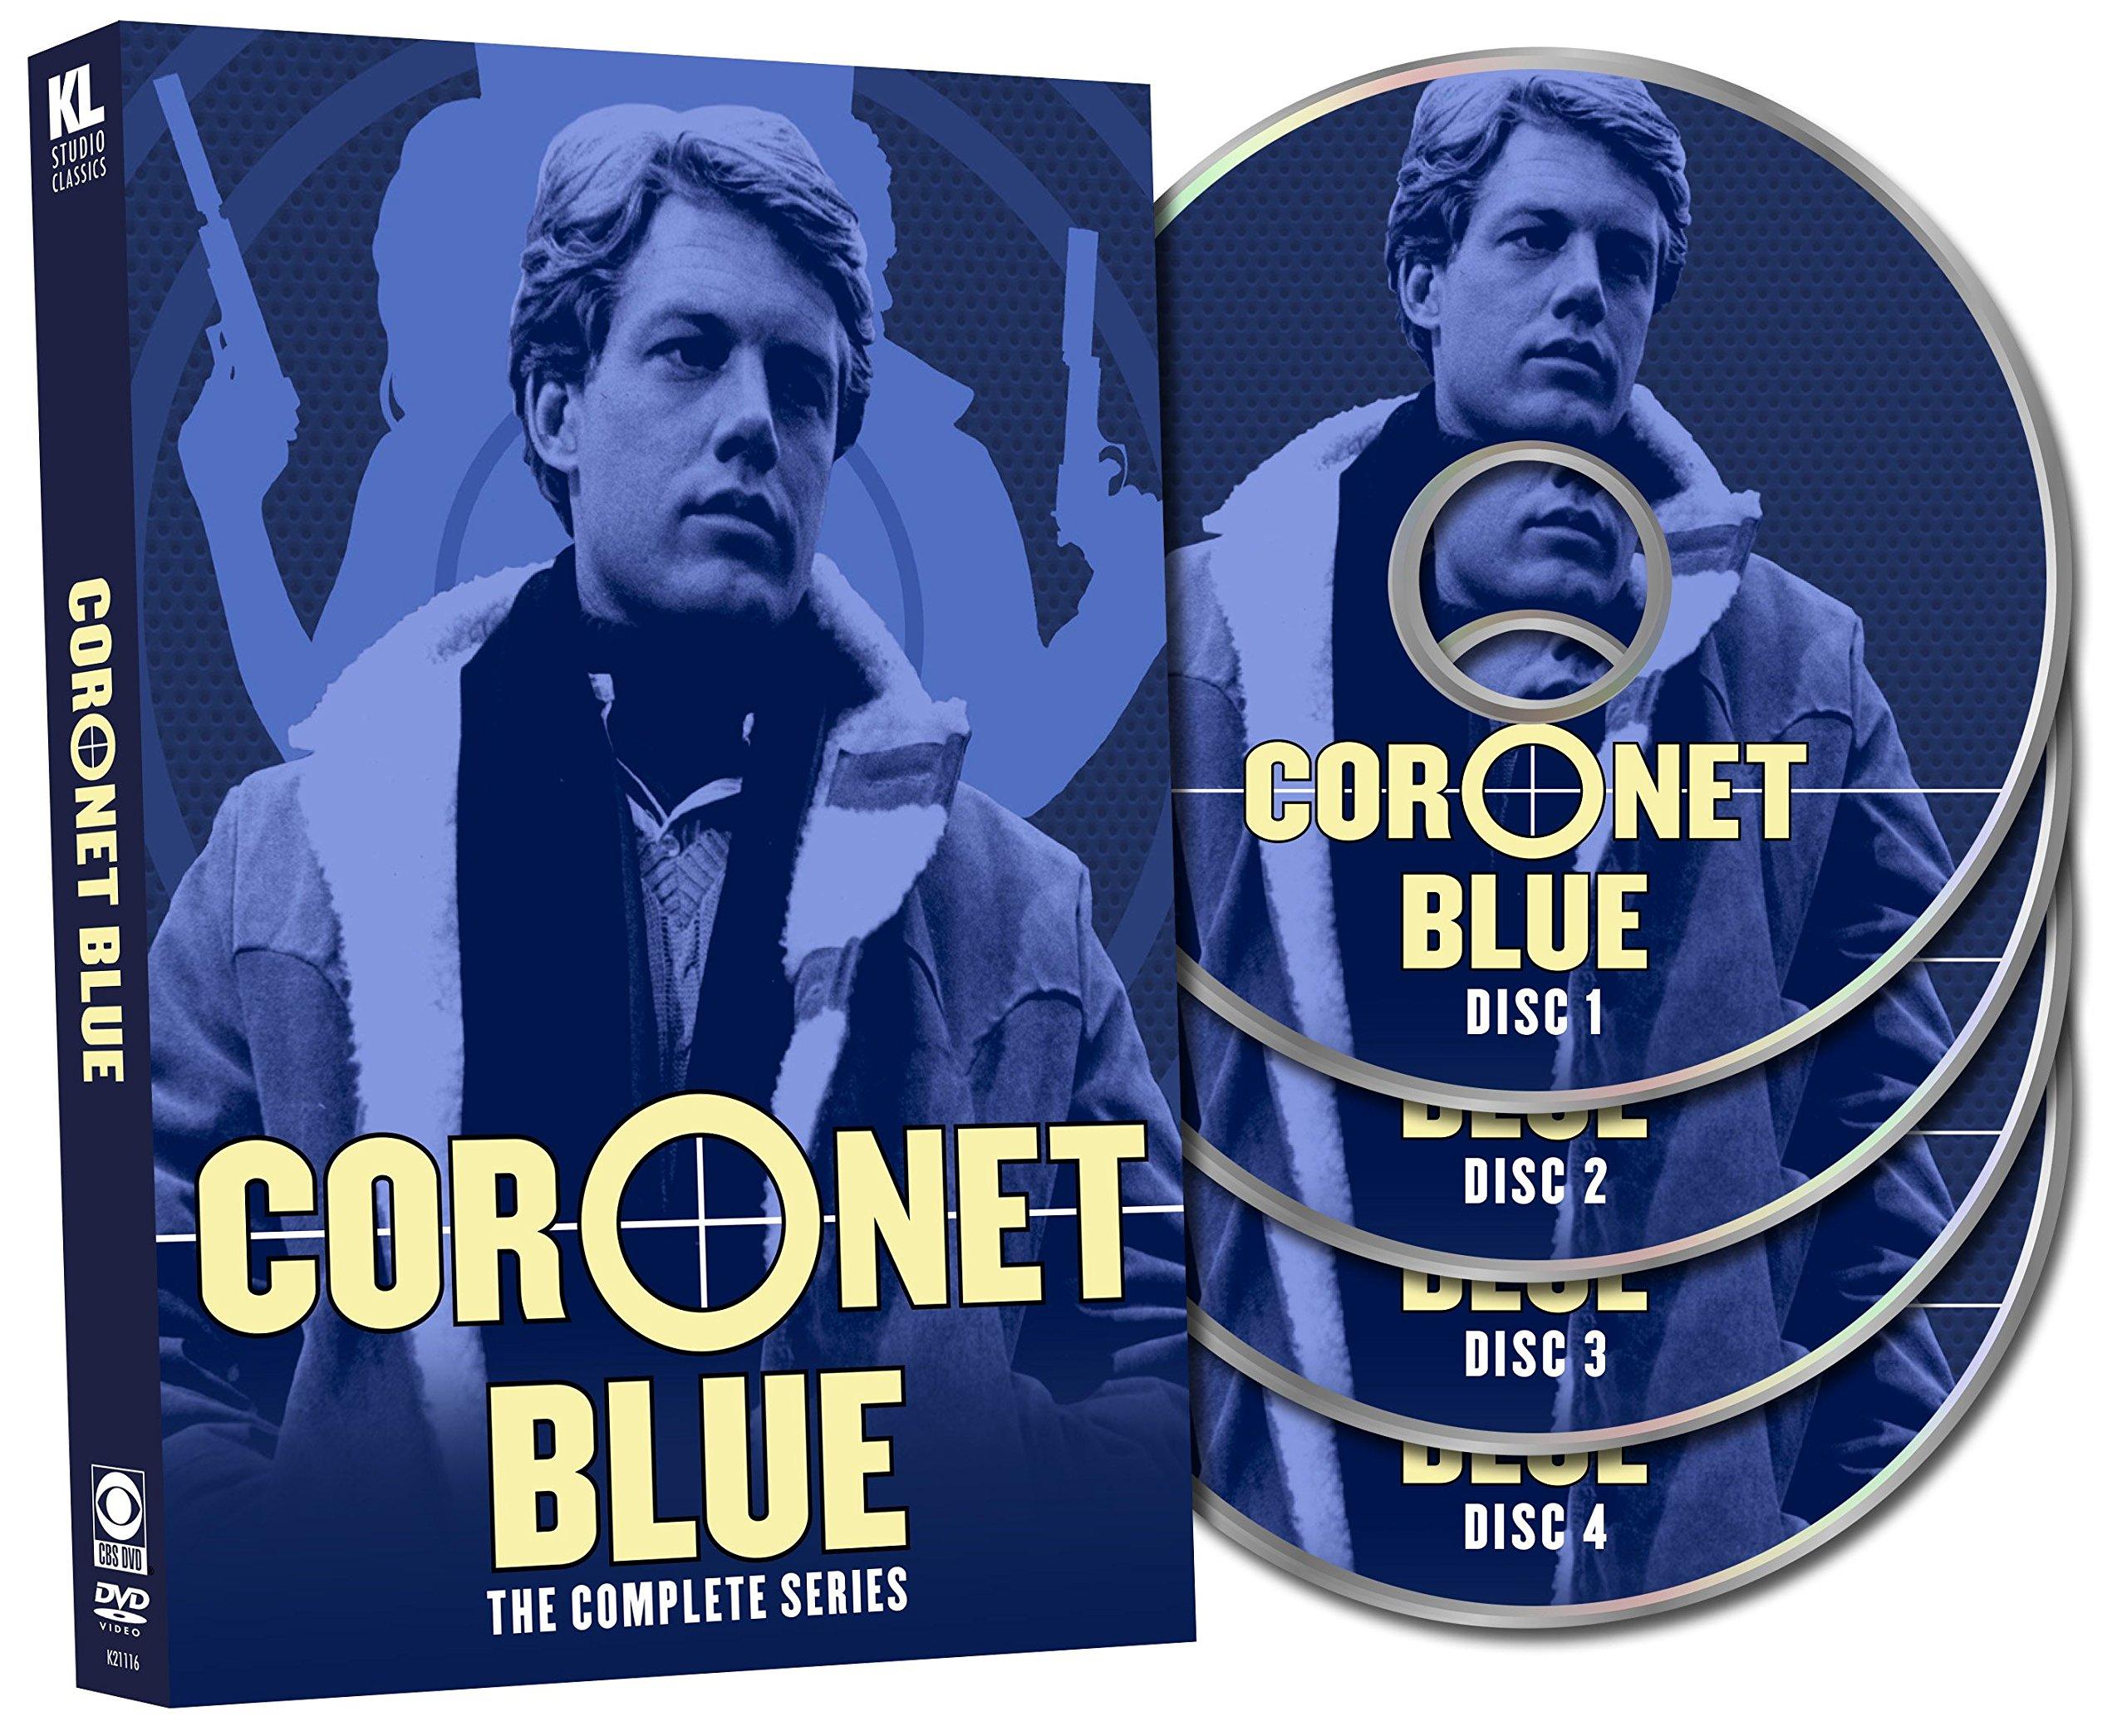 Coronet Blue (Complete TV Series)